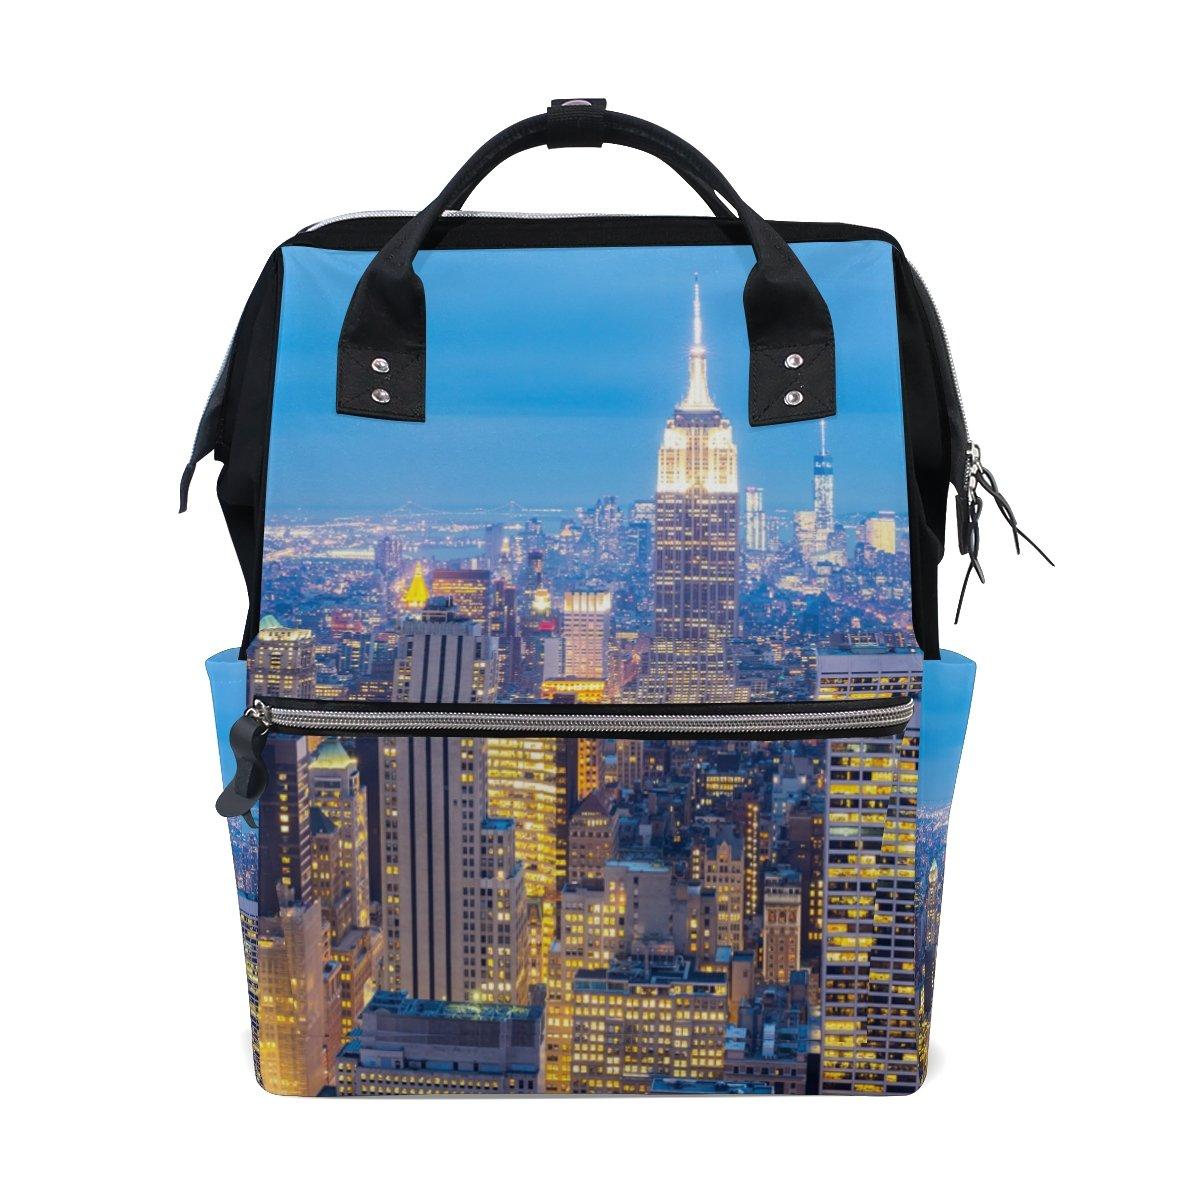 JSTeLノートカレッジバッグ学生旅行ニューヨーク市超高層ビル夕暮れ学校バックパックショルダートートバッグ   B078N6DMHJ